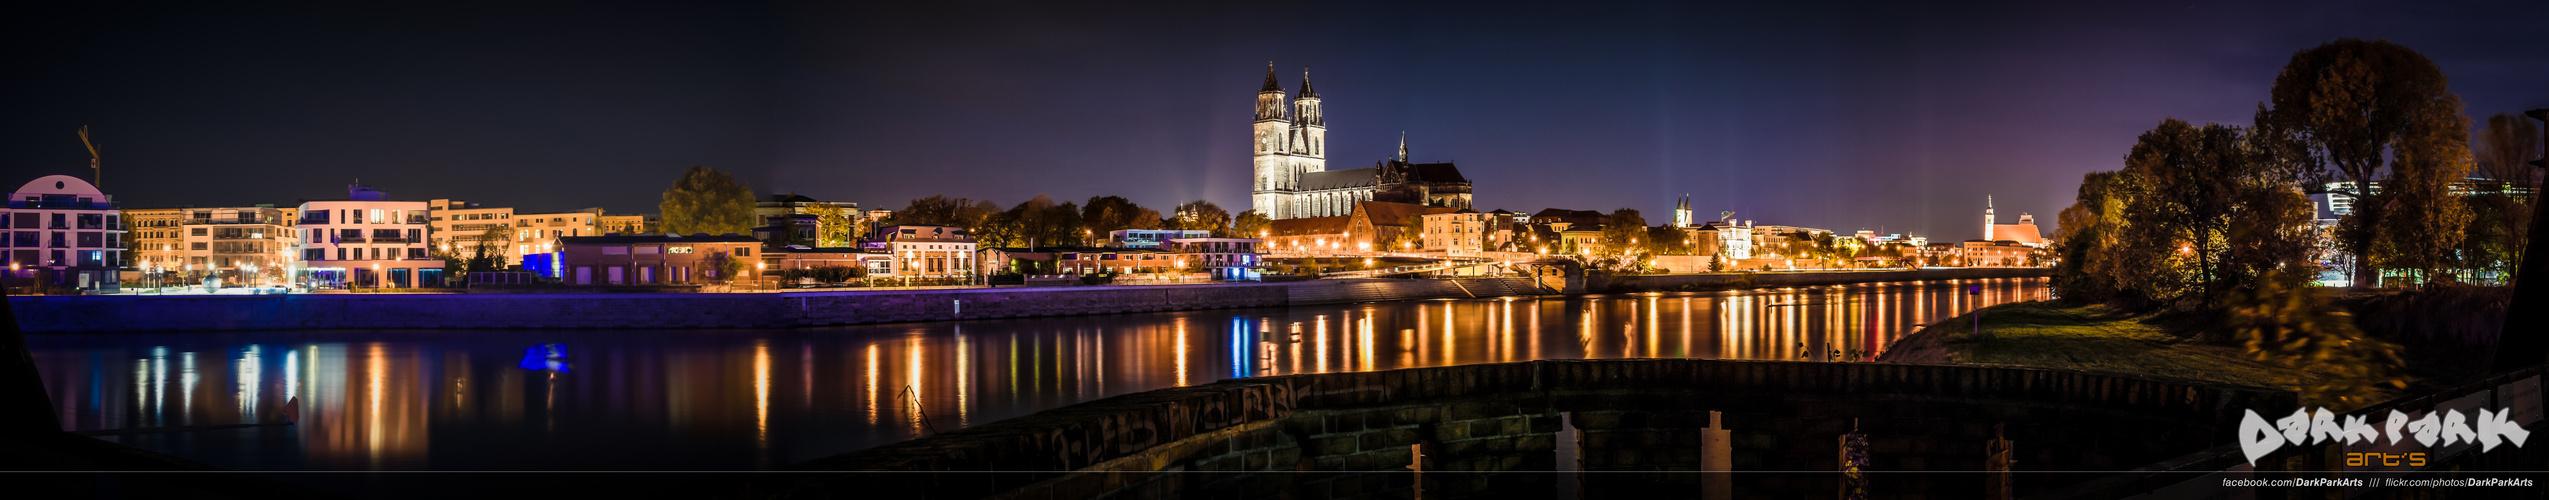 Night Skyline from Magdeburg